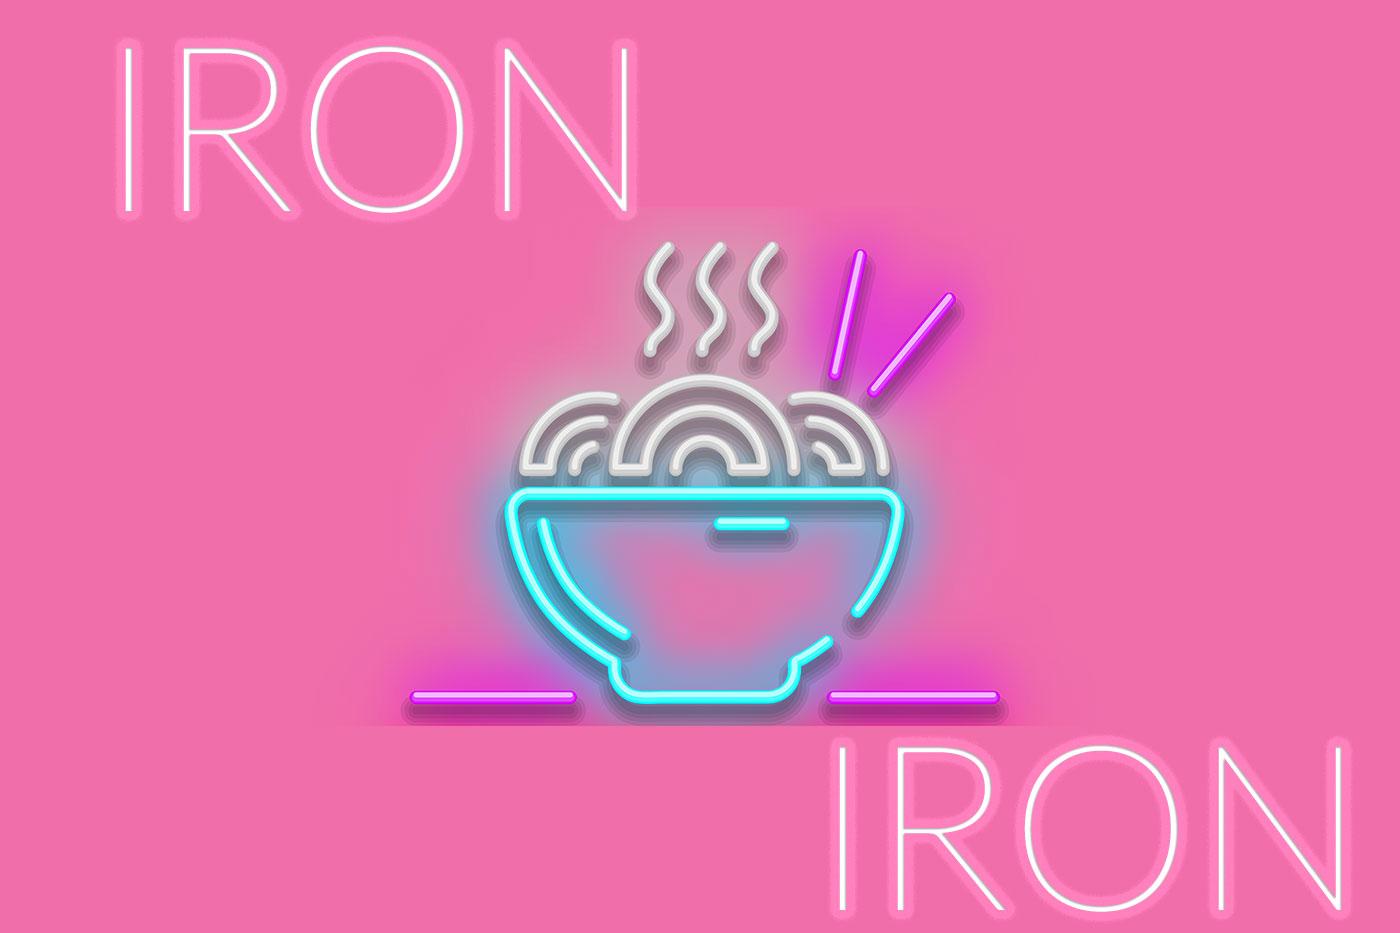 Track: Iron- 127 BPM